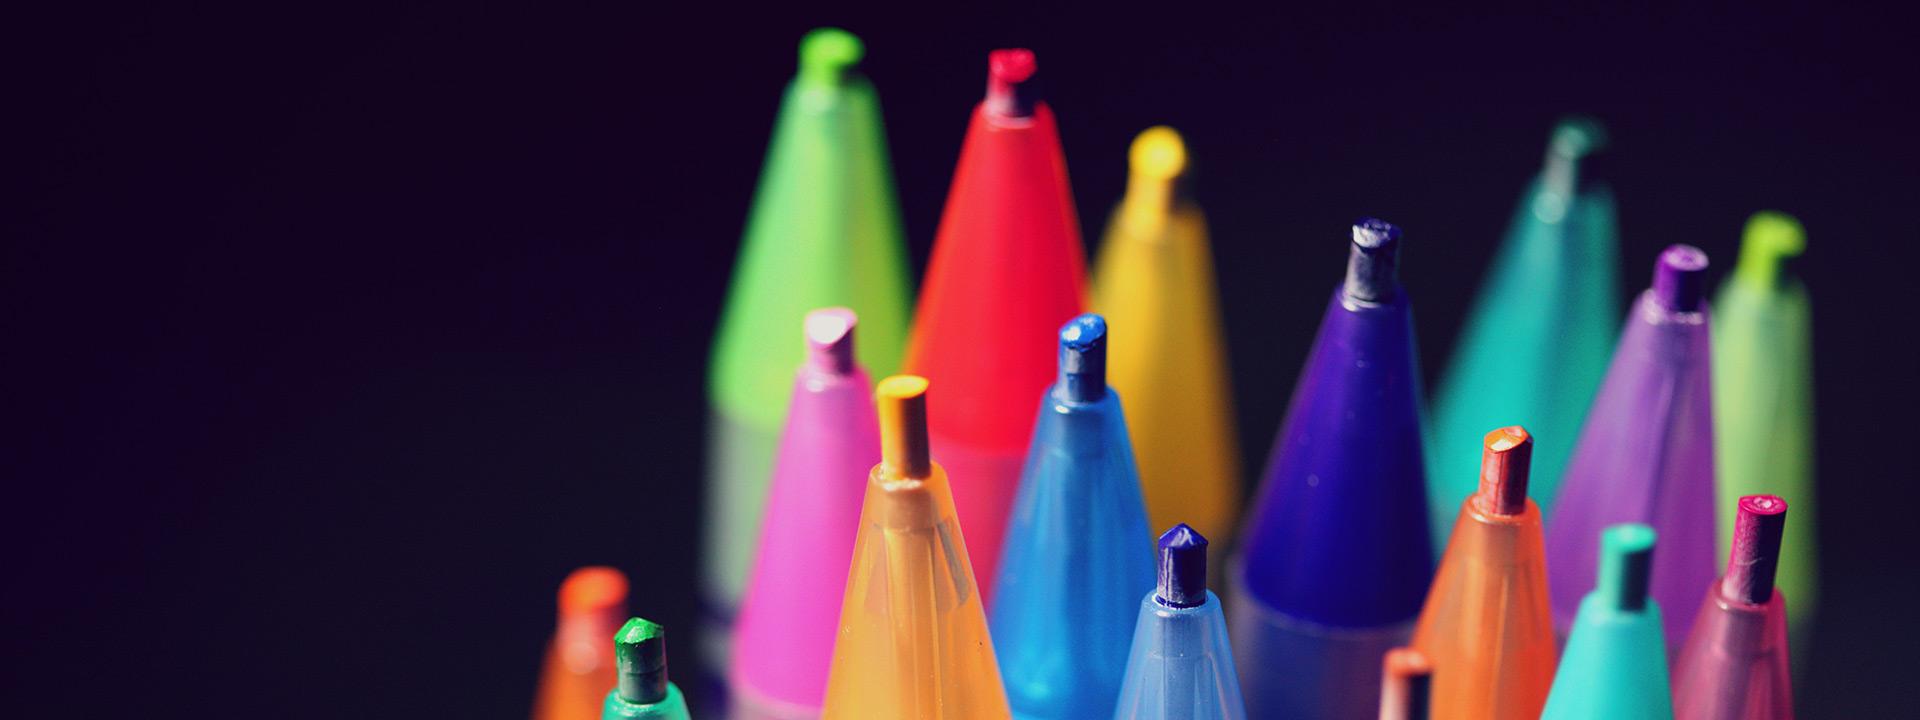 Diversity and multidisciplinarity in software development teams